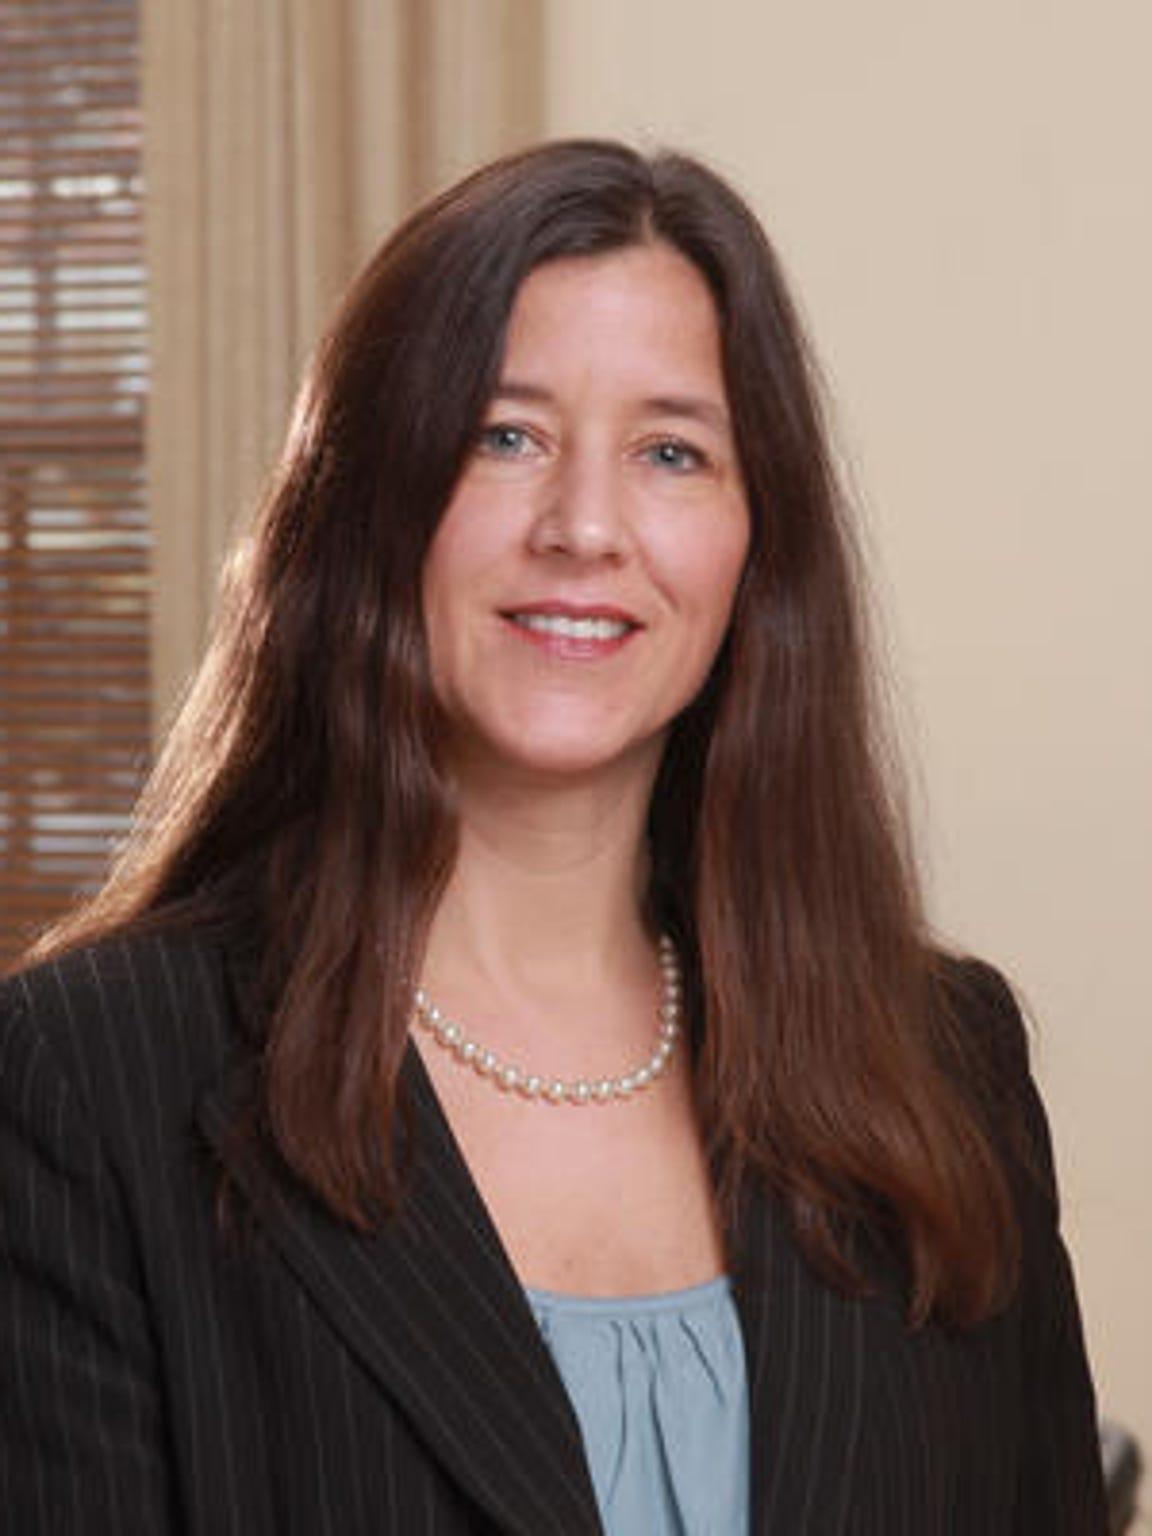 Bernice Whaley is Delaware's director of economic development